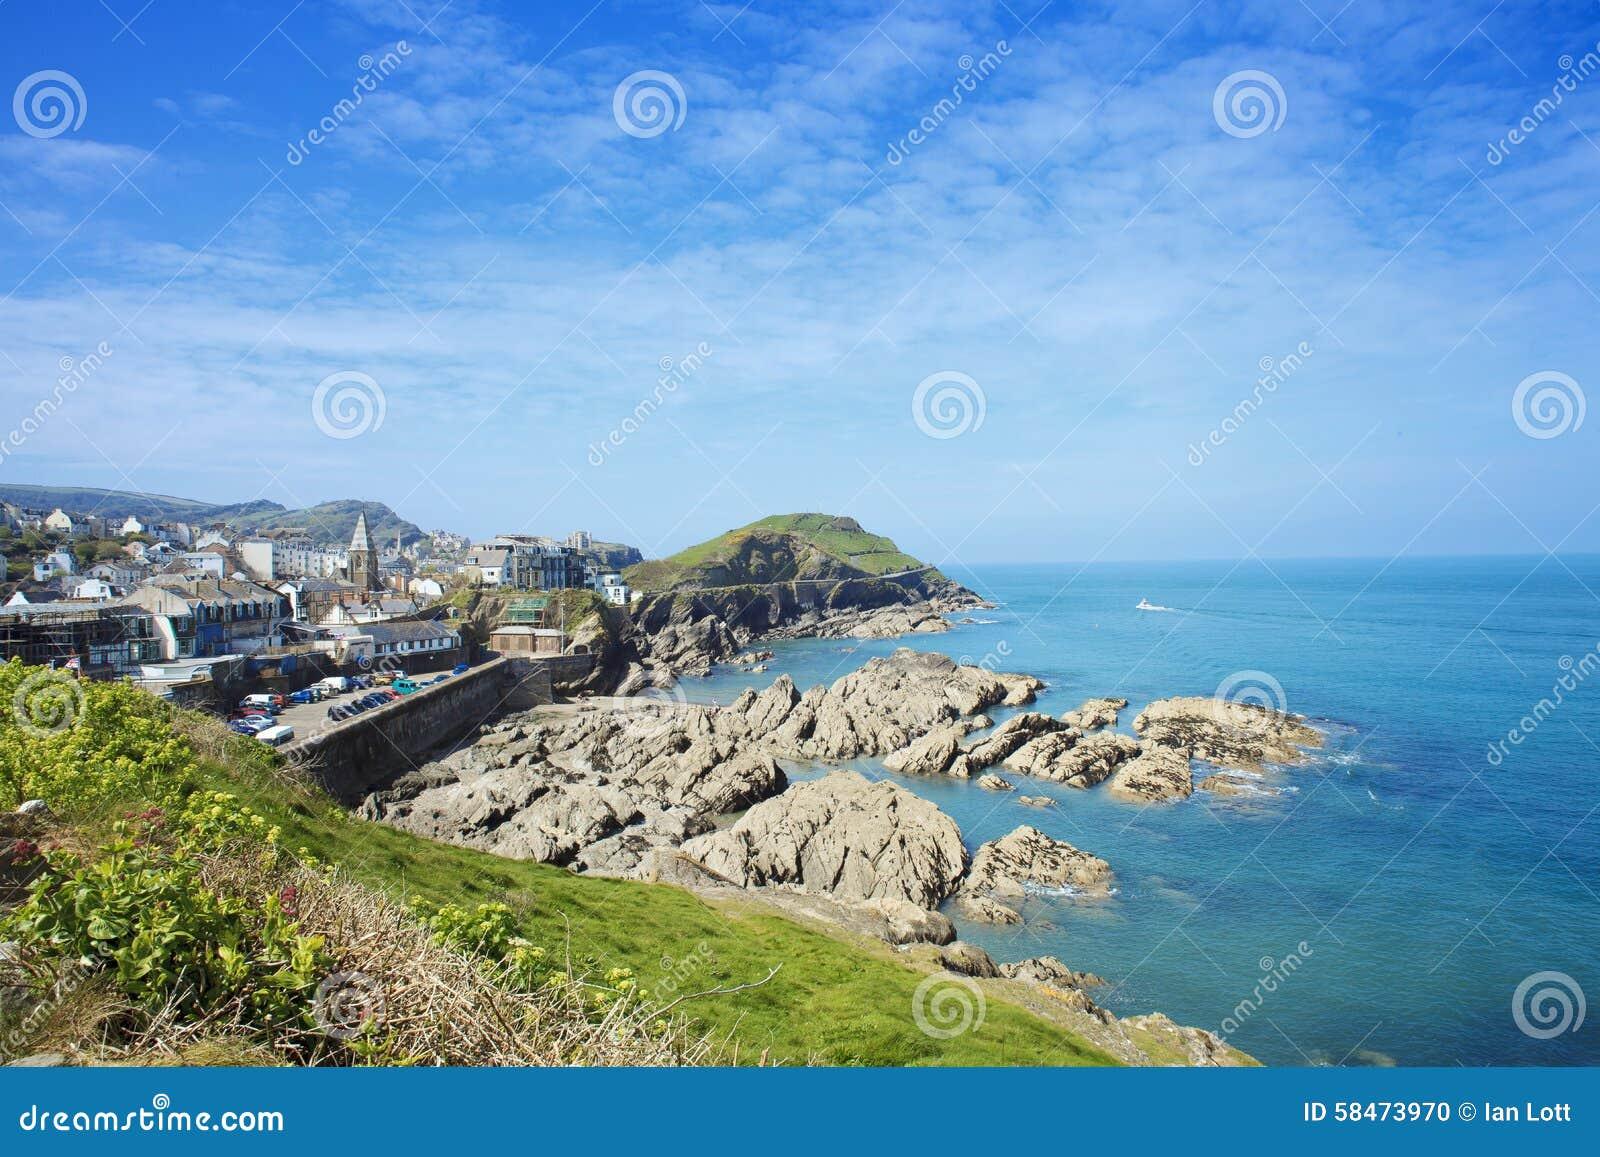 Ilfracombe on the North Devon coast, England